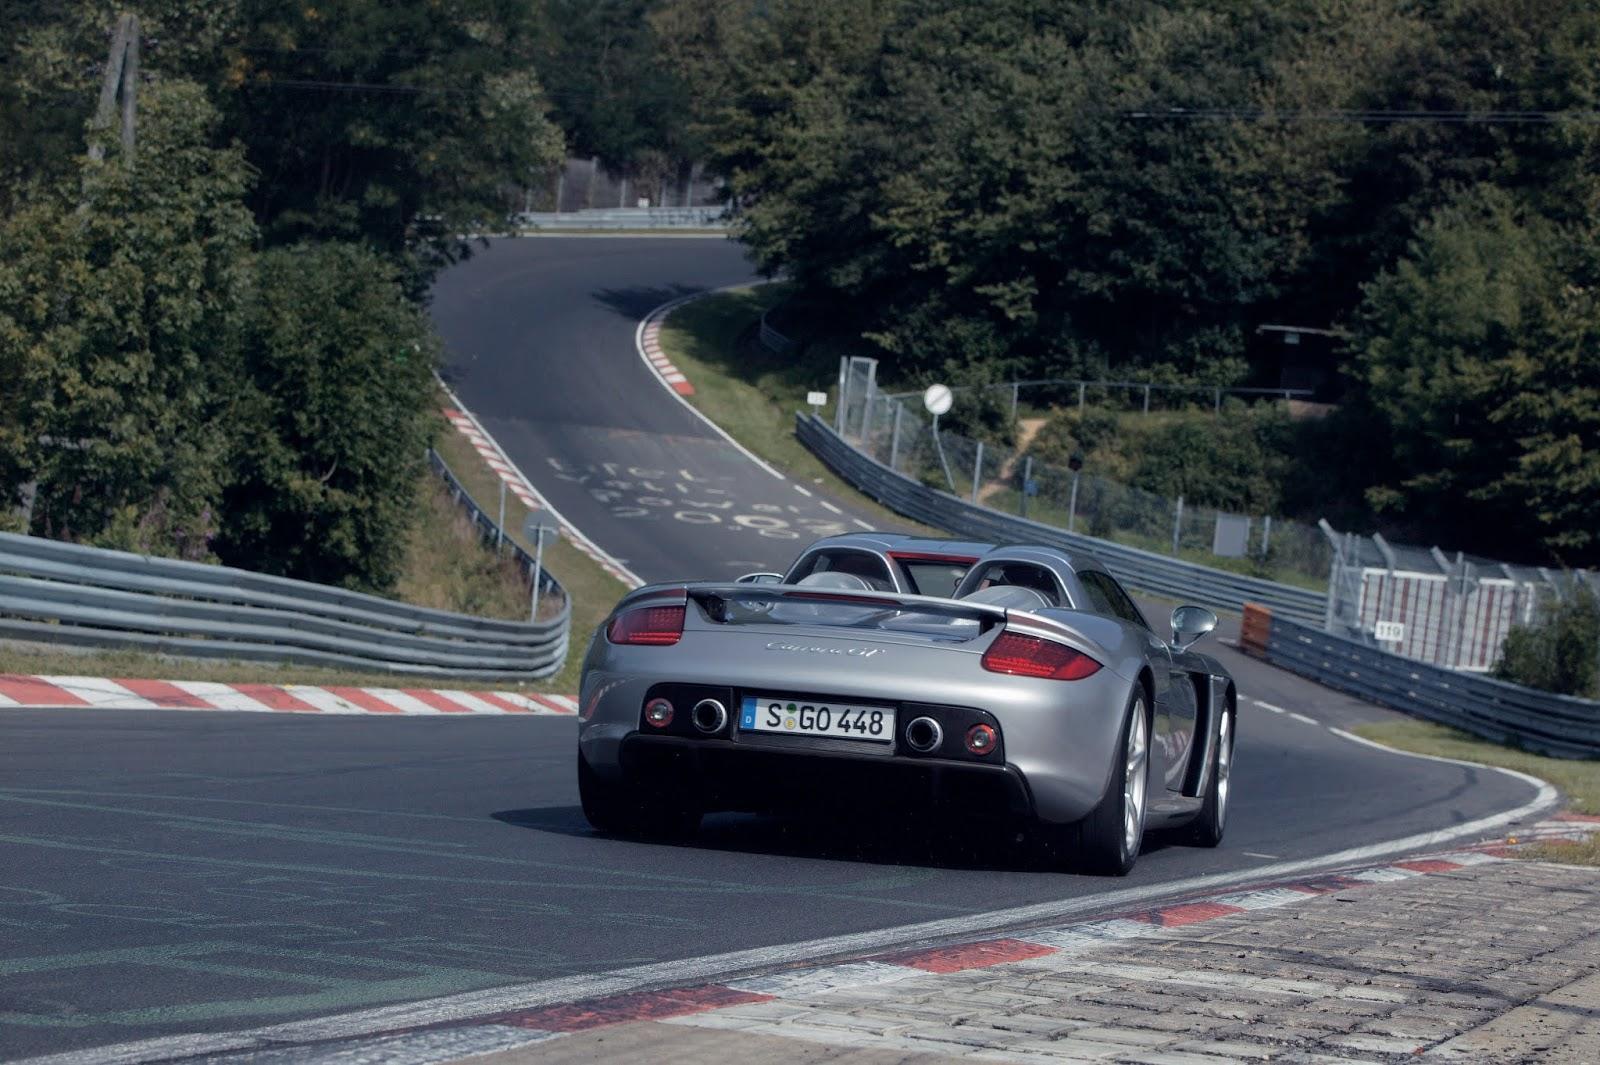 P05 0195 a4 Porsche Carrera GT : Ένα αγωνιστικό LeMans, για το δρόμο Carrera GT, Porsche, Porsche Carrera GT, retrocar, retrocar sunday, supercar, zblog